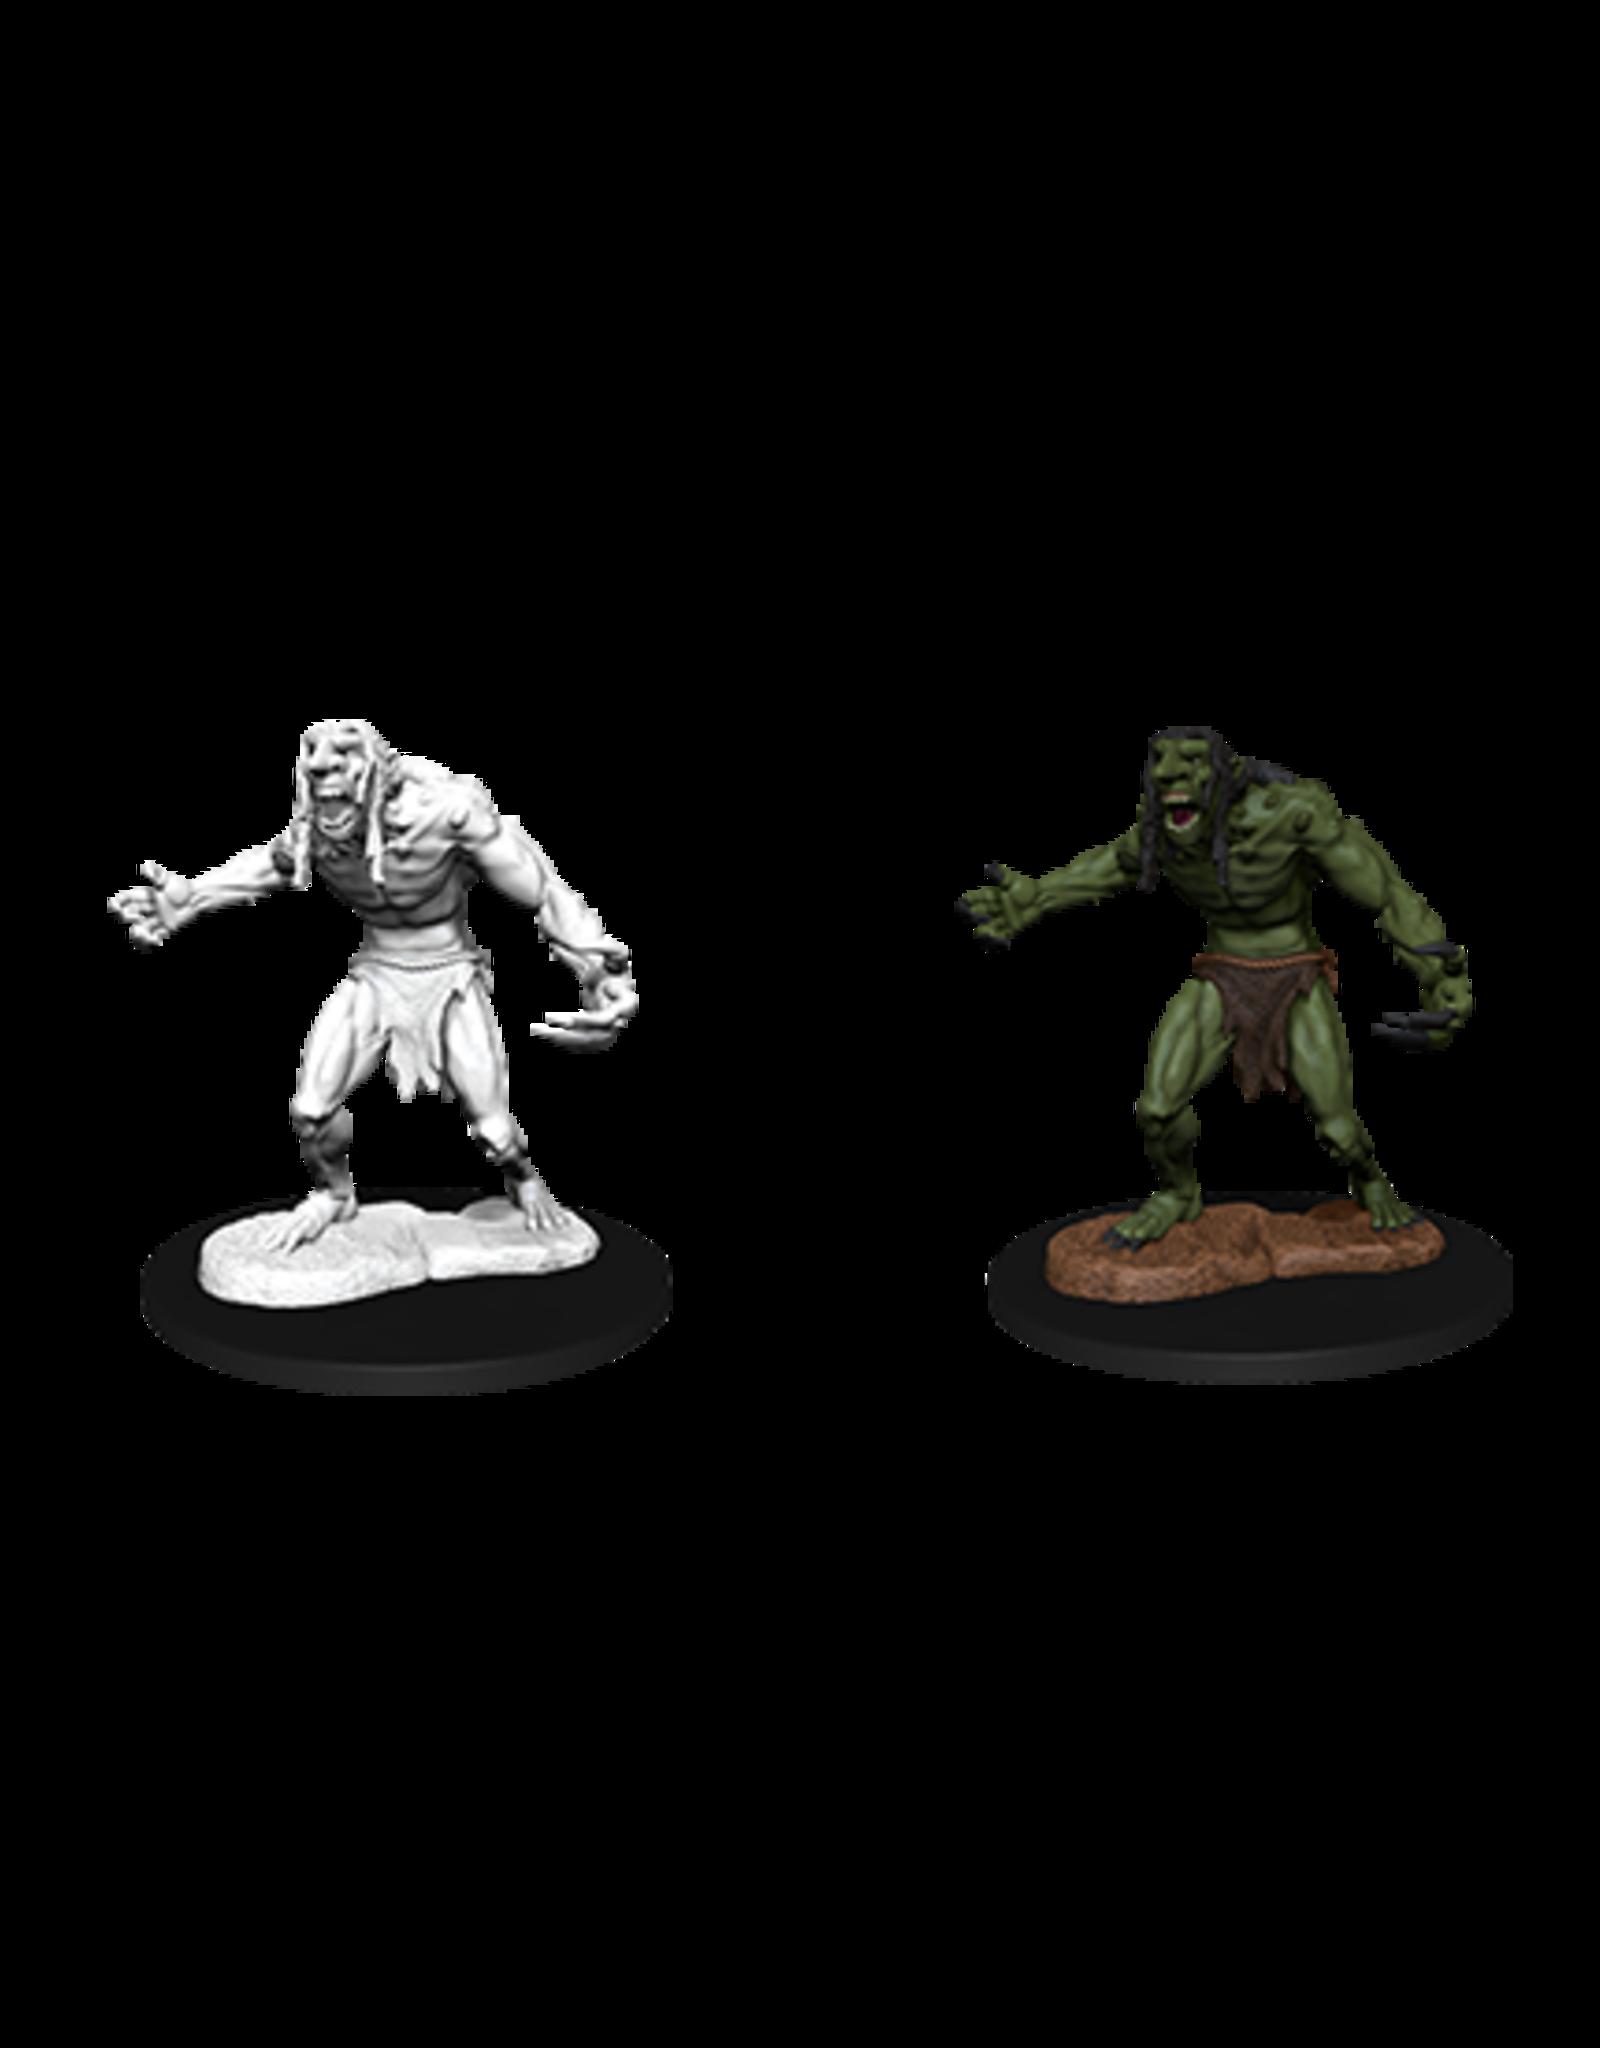 Nolzur's Marvelous Miniatures D&D D&D NMU - Raging Troll (W12)